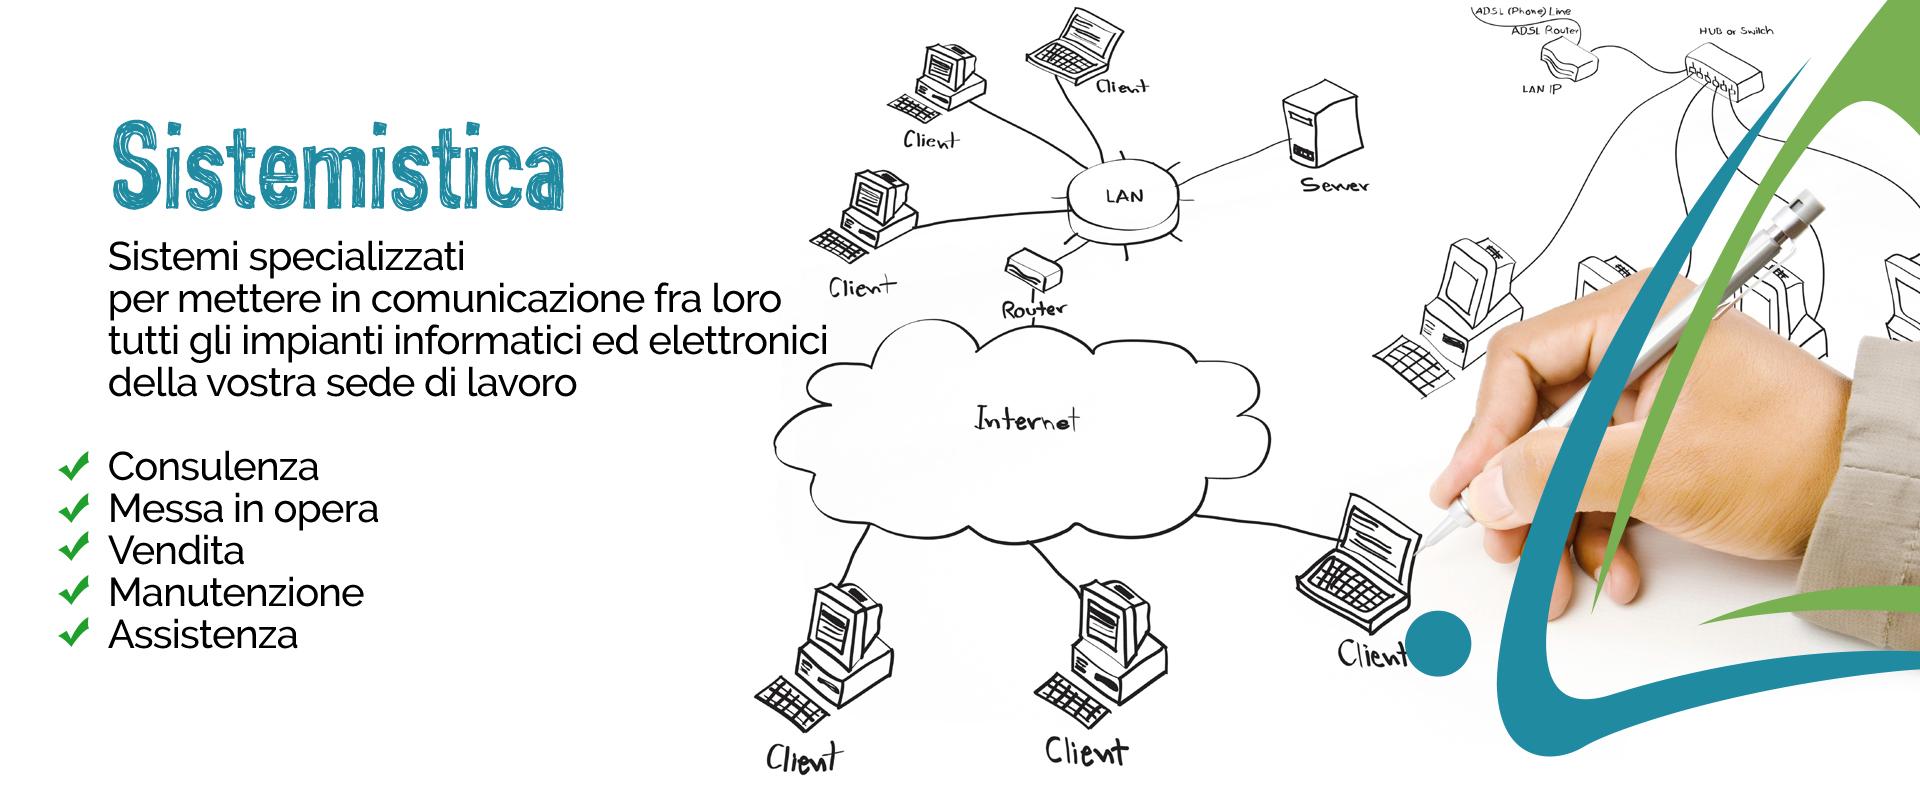 deltacom messina informatica telecomunicazioni centralini centralino telefonia antivirus